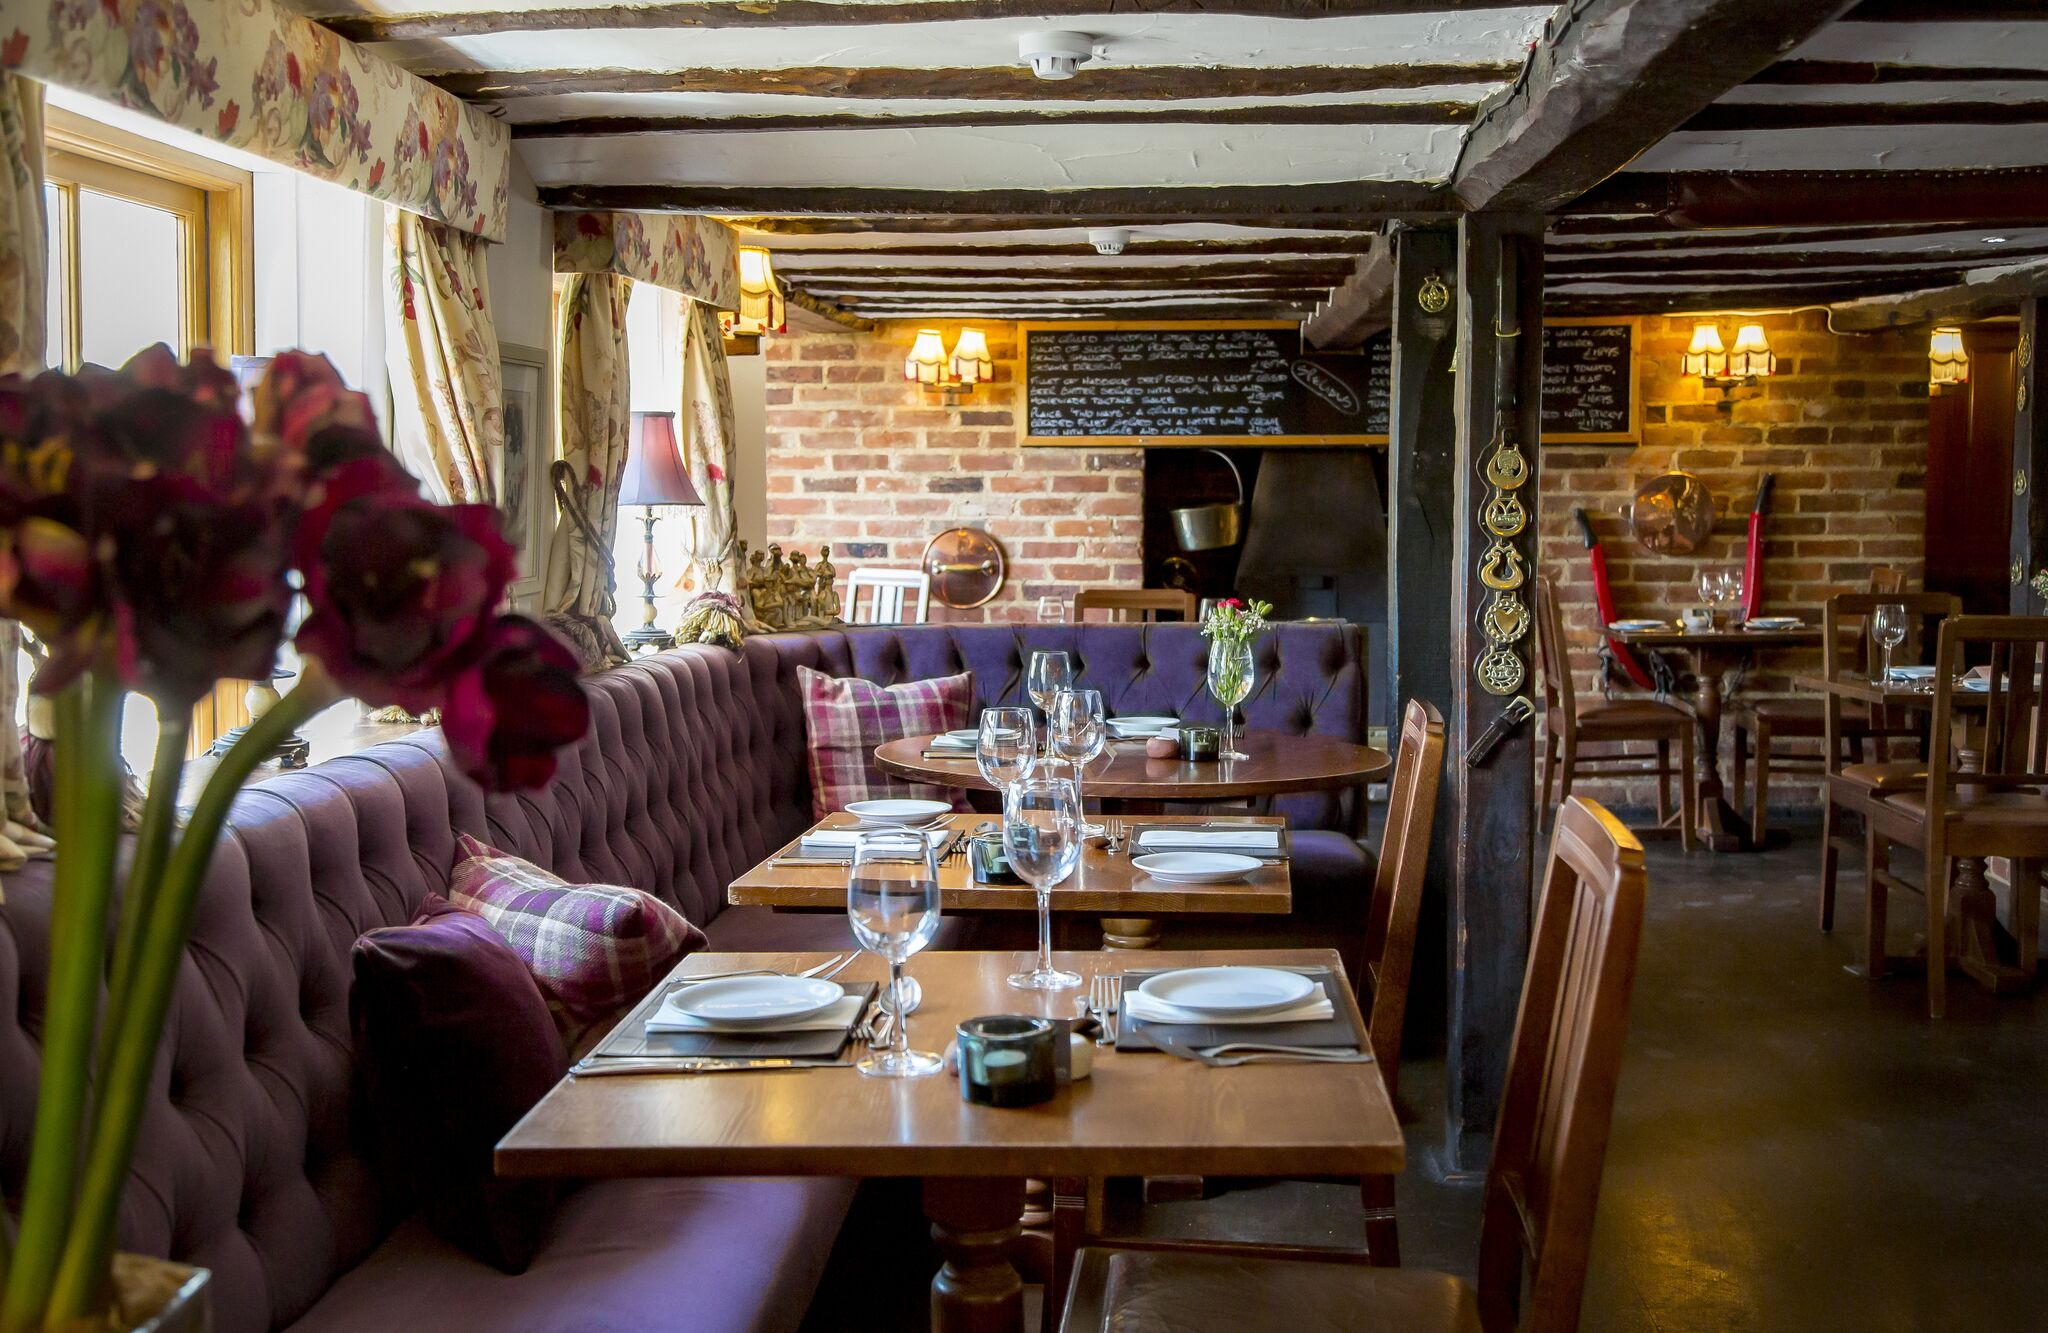 Restaurant layout - Cricketers